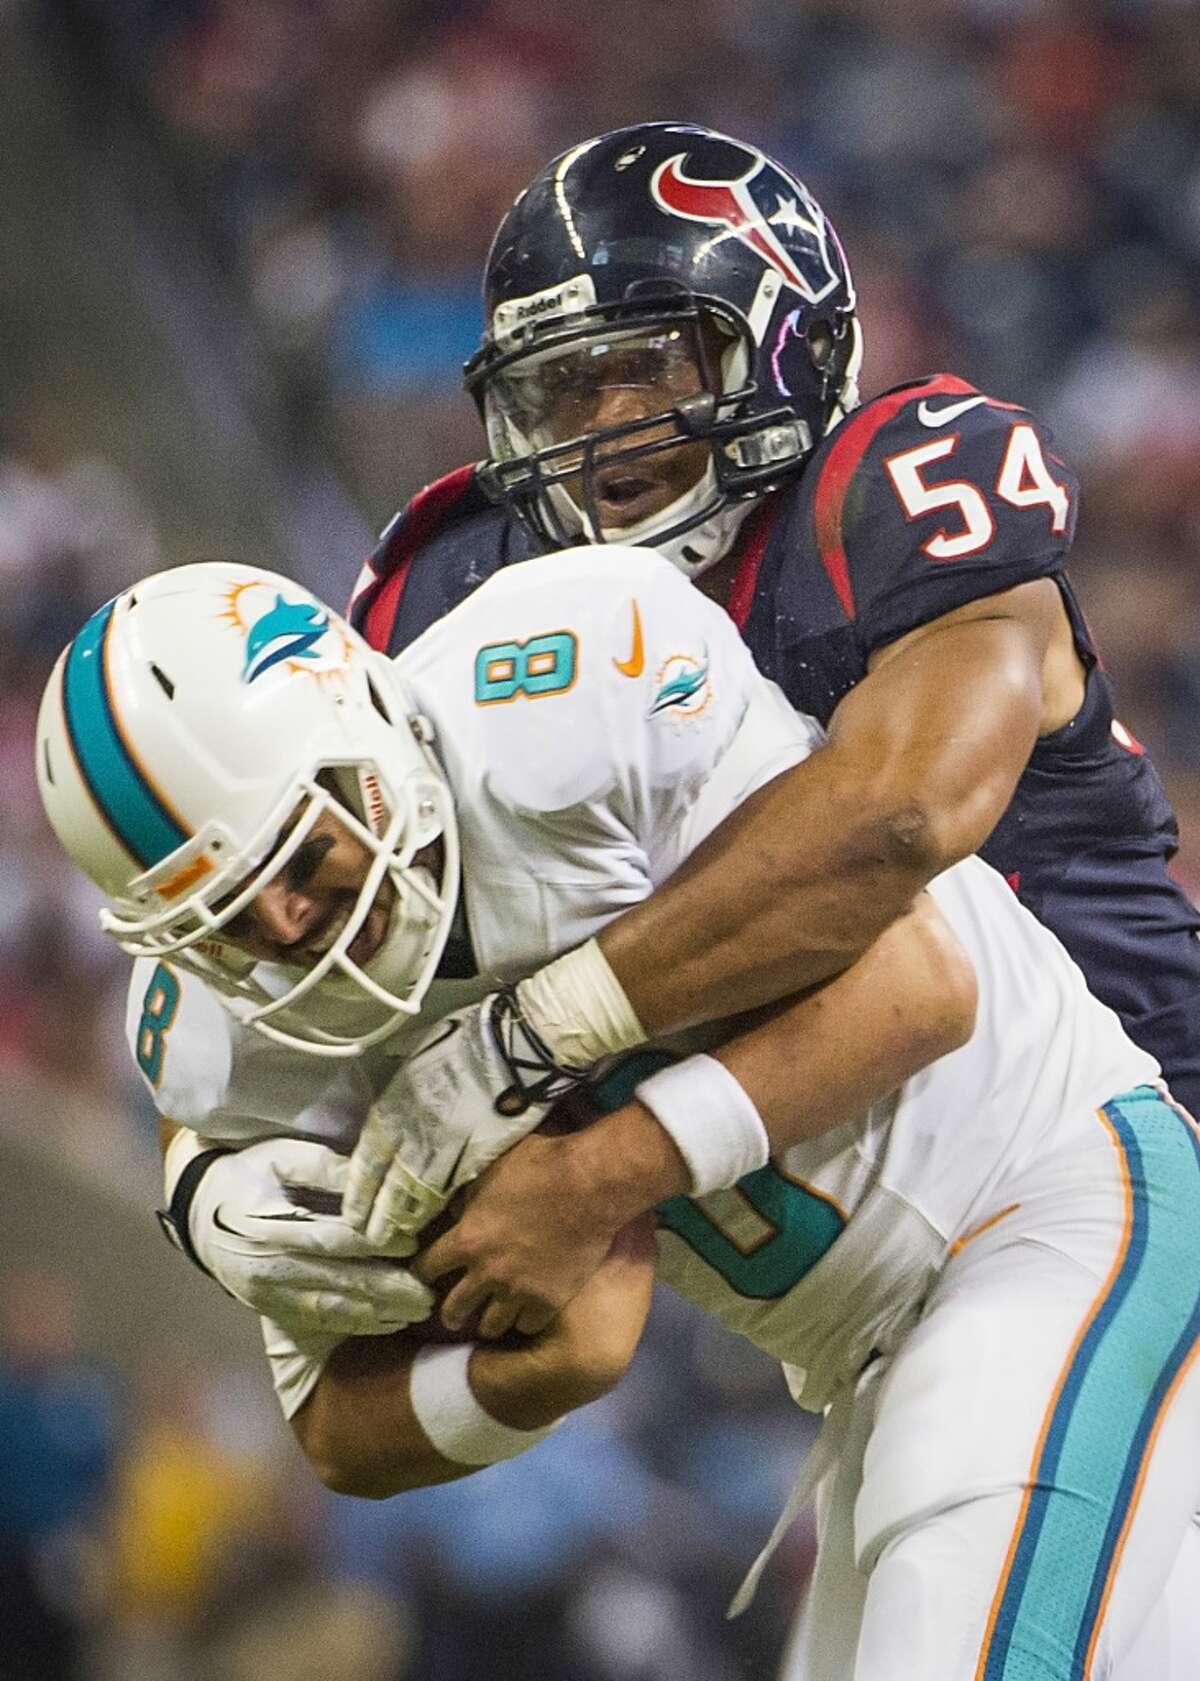 Texans linebacker Trevardo Williams sacks Dolphins quarterback Matt Moore.